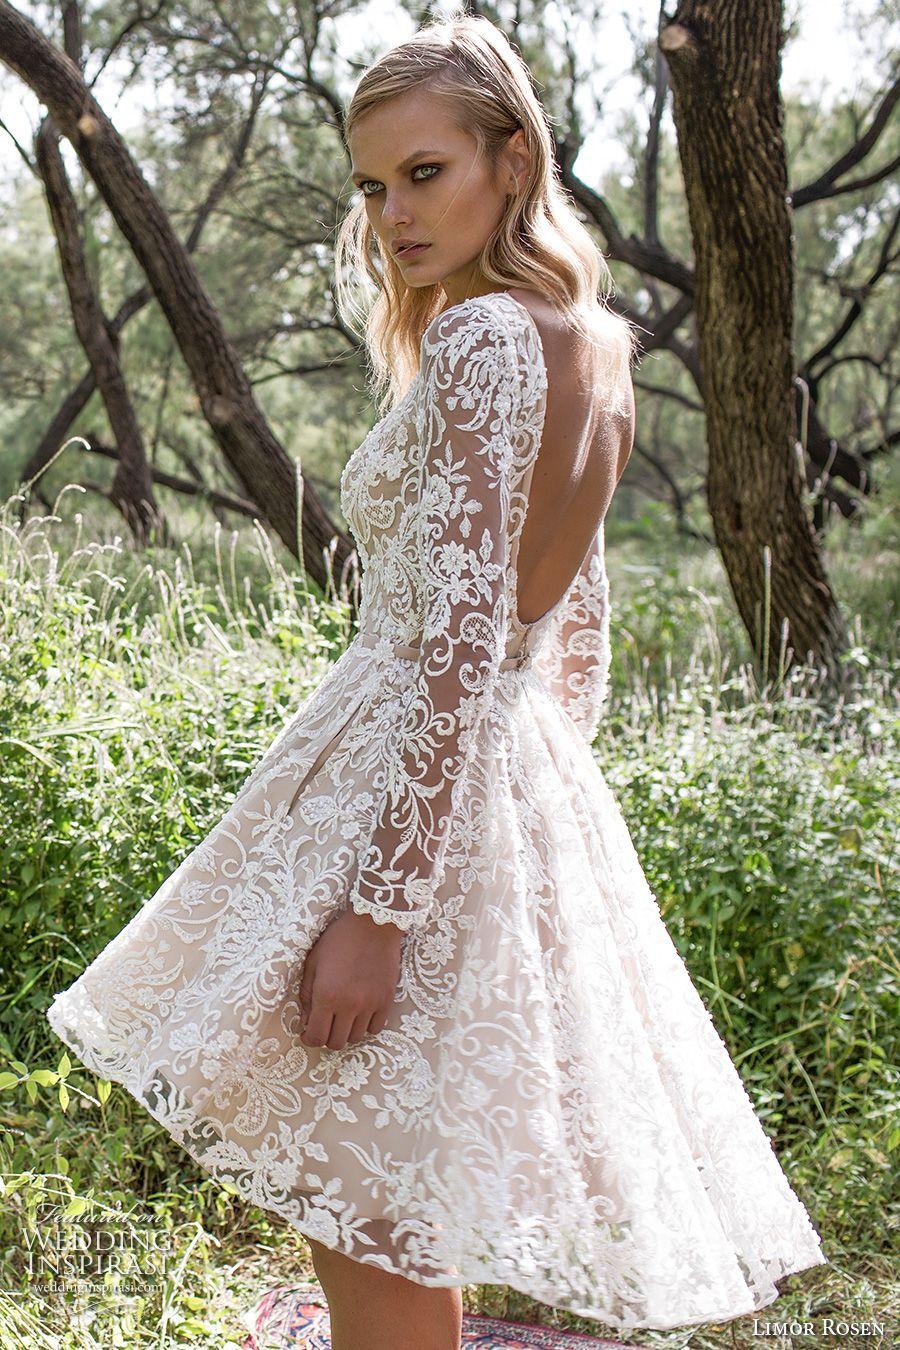 Limor Rosen 2017 Wedding Dresses Birds Of Paradise Bridal Collection Wedding Inspirasi Short Wedding Dress Wedding Dresses Wedding Dress With Pockets [ 1350 x 900 Pixel ]